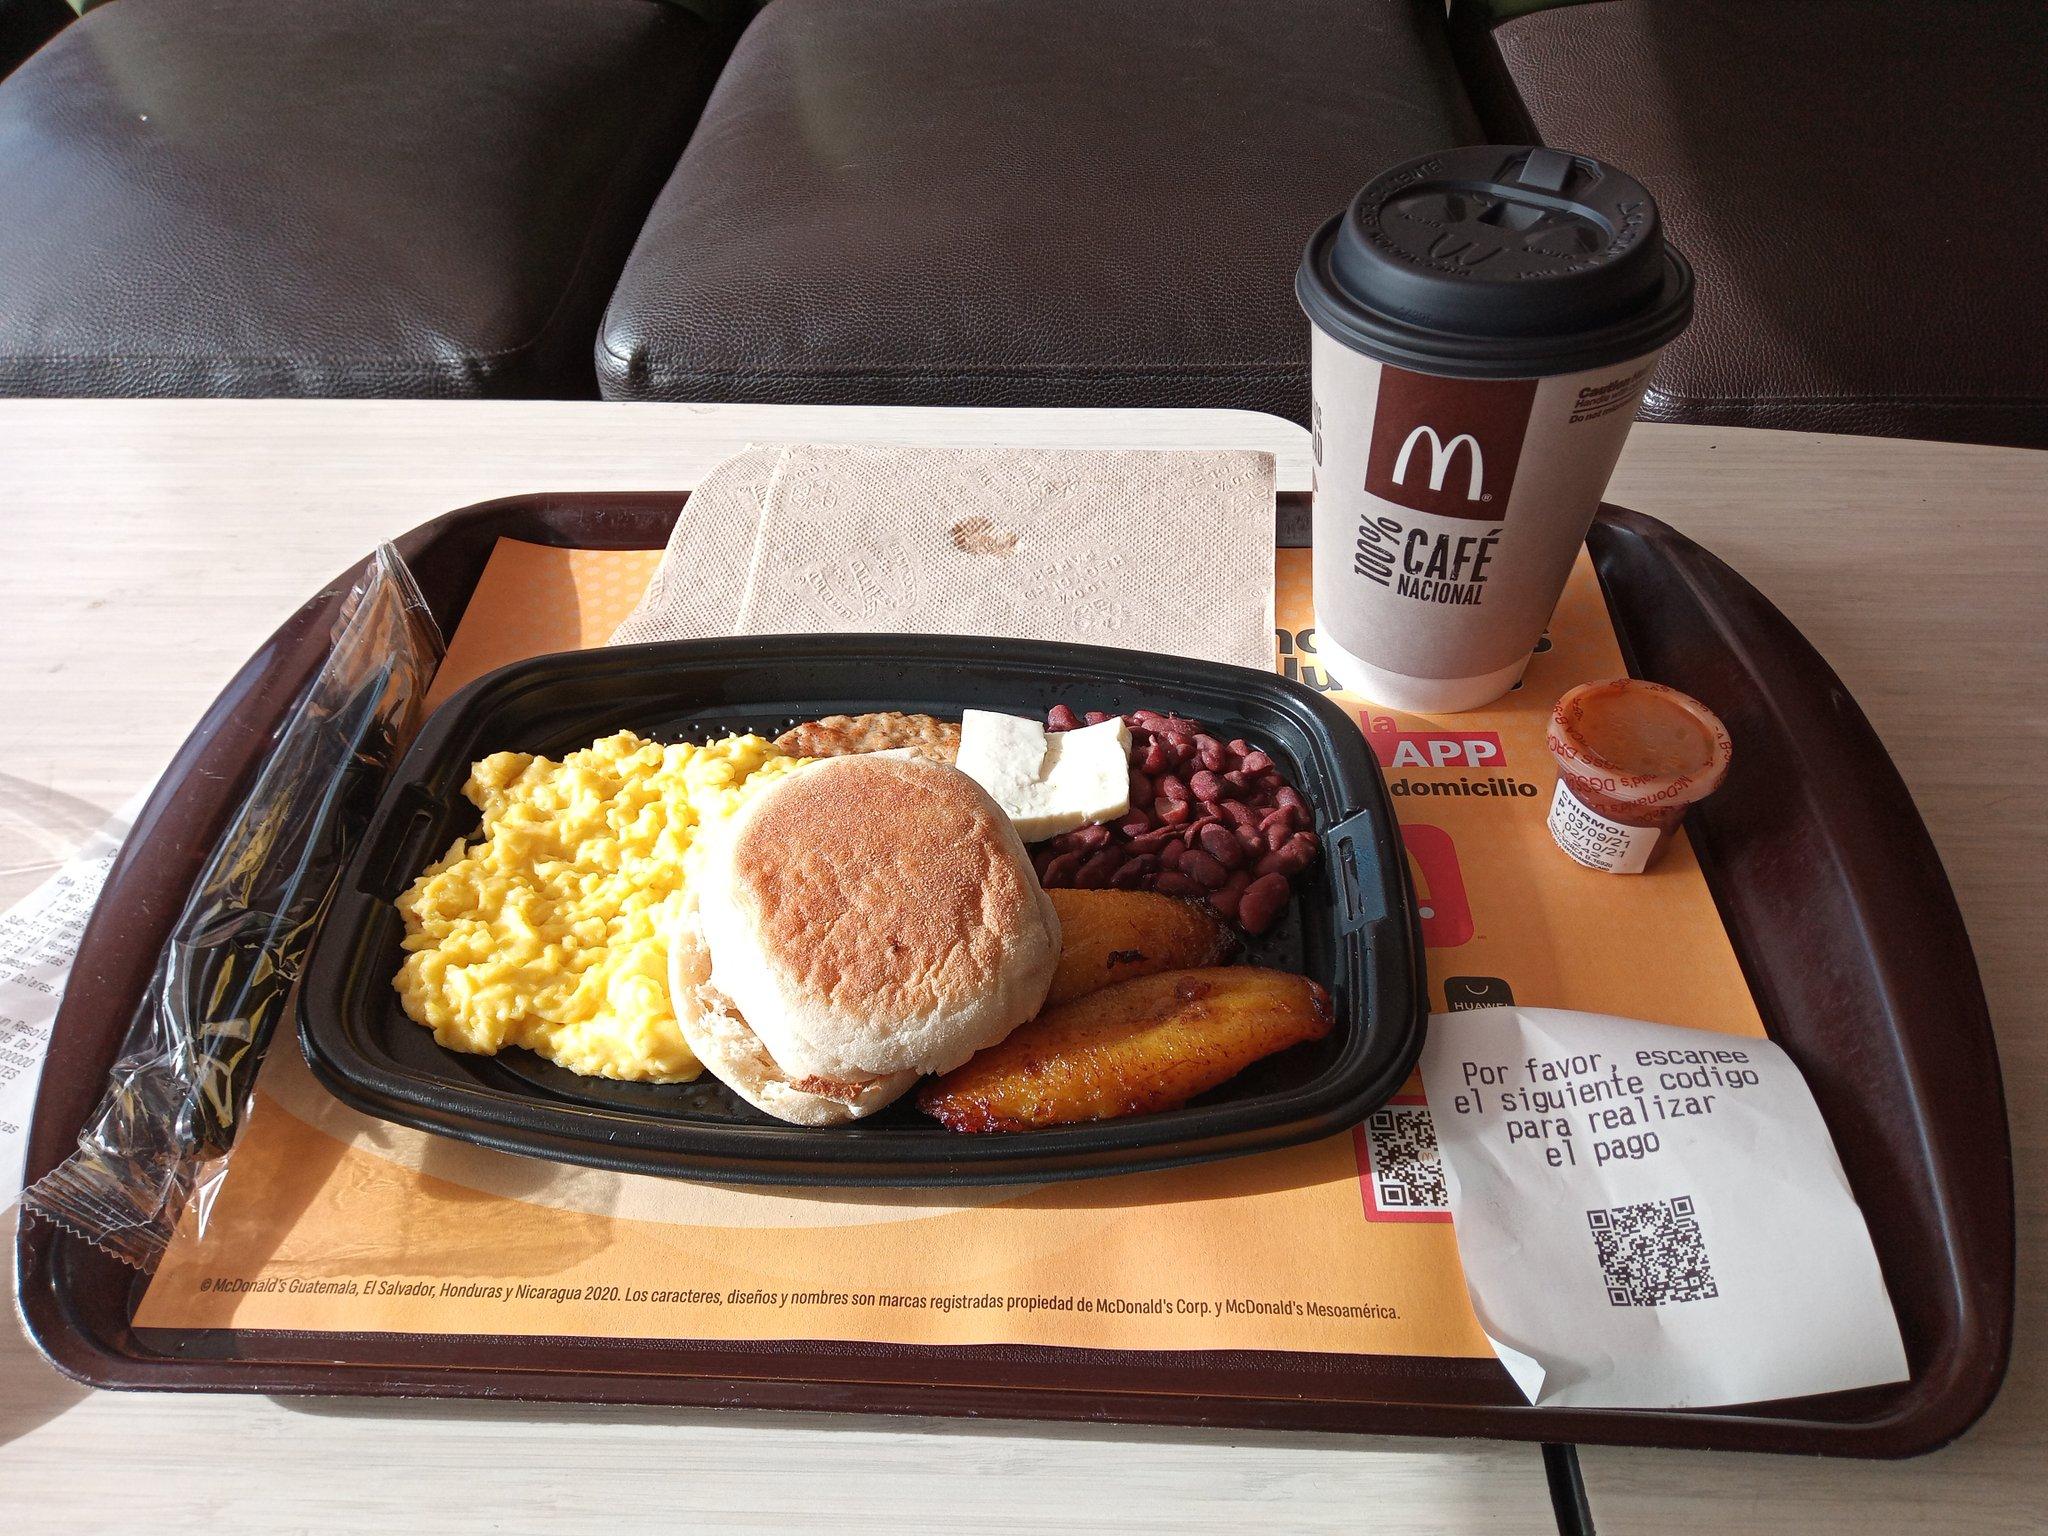 Bitcoin paid McDonald's meal in El Salvador, Sep 2021